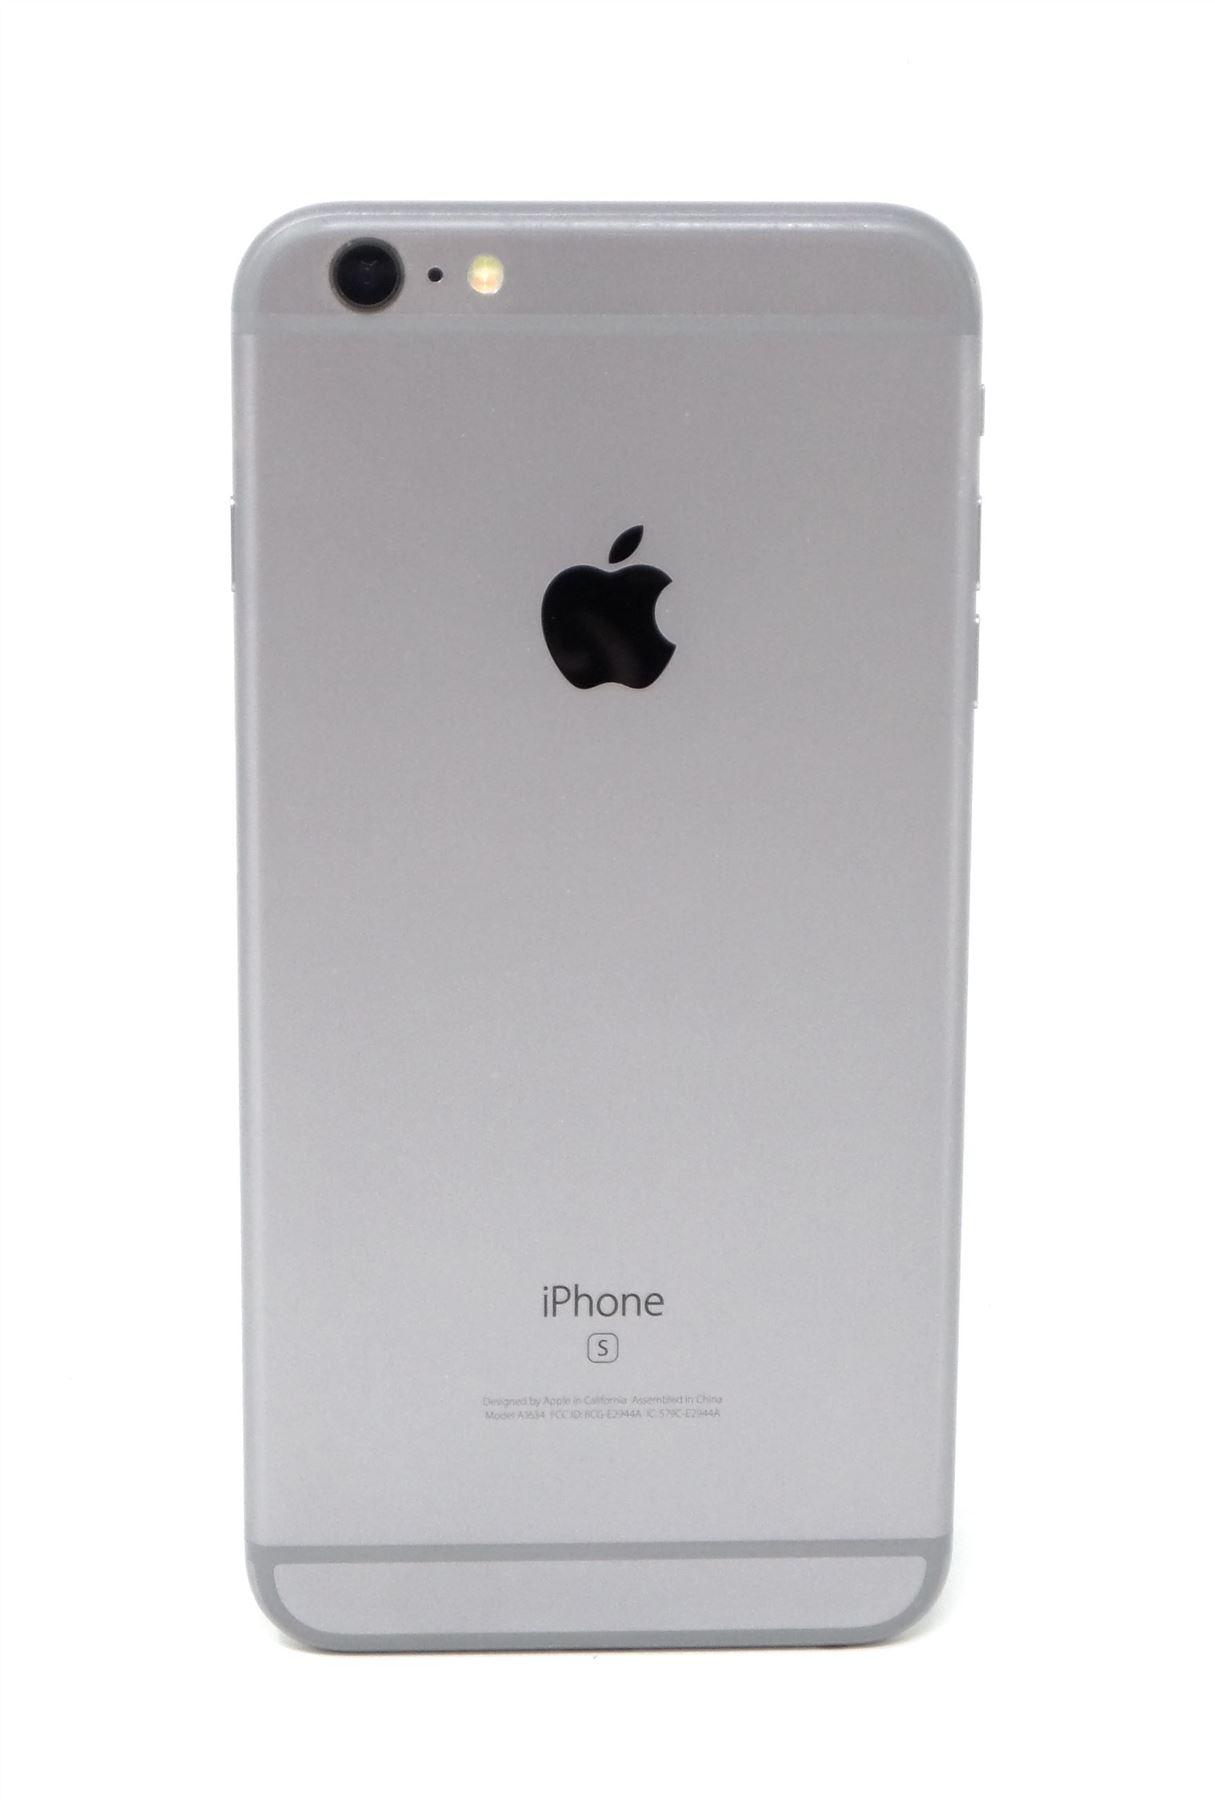 Apple-iPhone-6S-Plus-Carrier-Options-AT-amp-T-T-Mobile-Verizon-Unlocked-16-64-128GB thumbnail 11